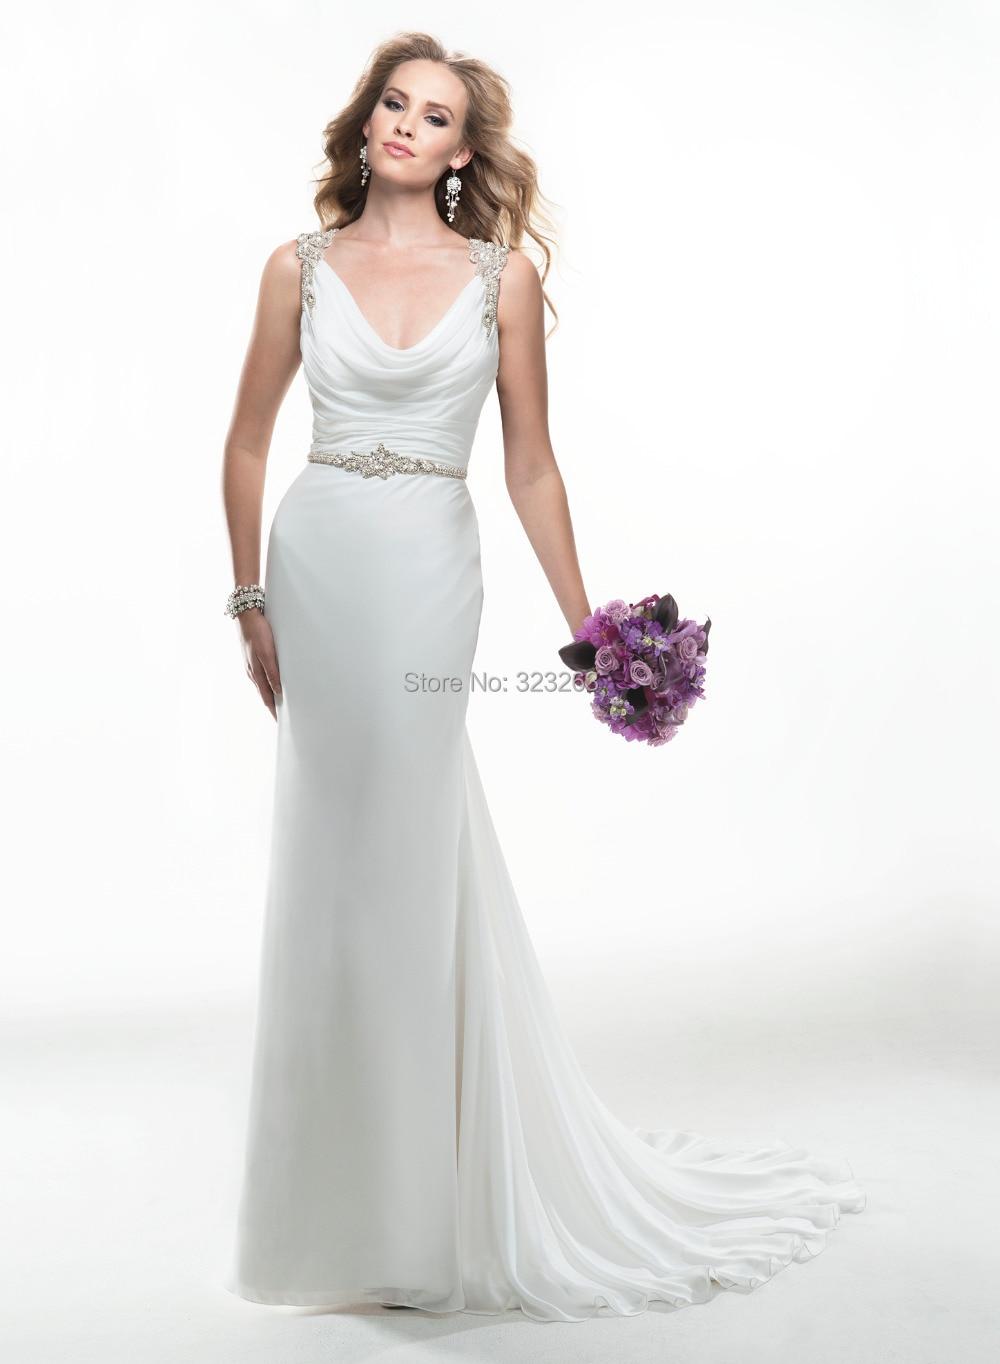 simple wedding dress collection cowl neck wedding dress 2